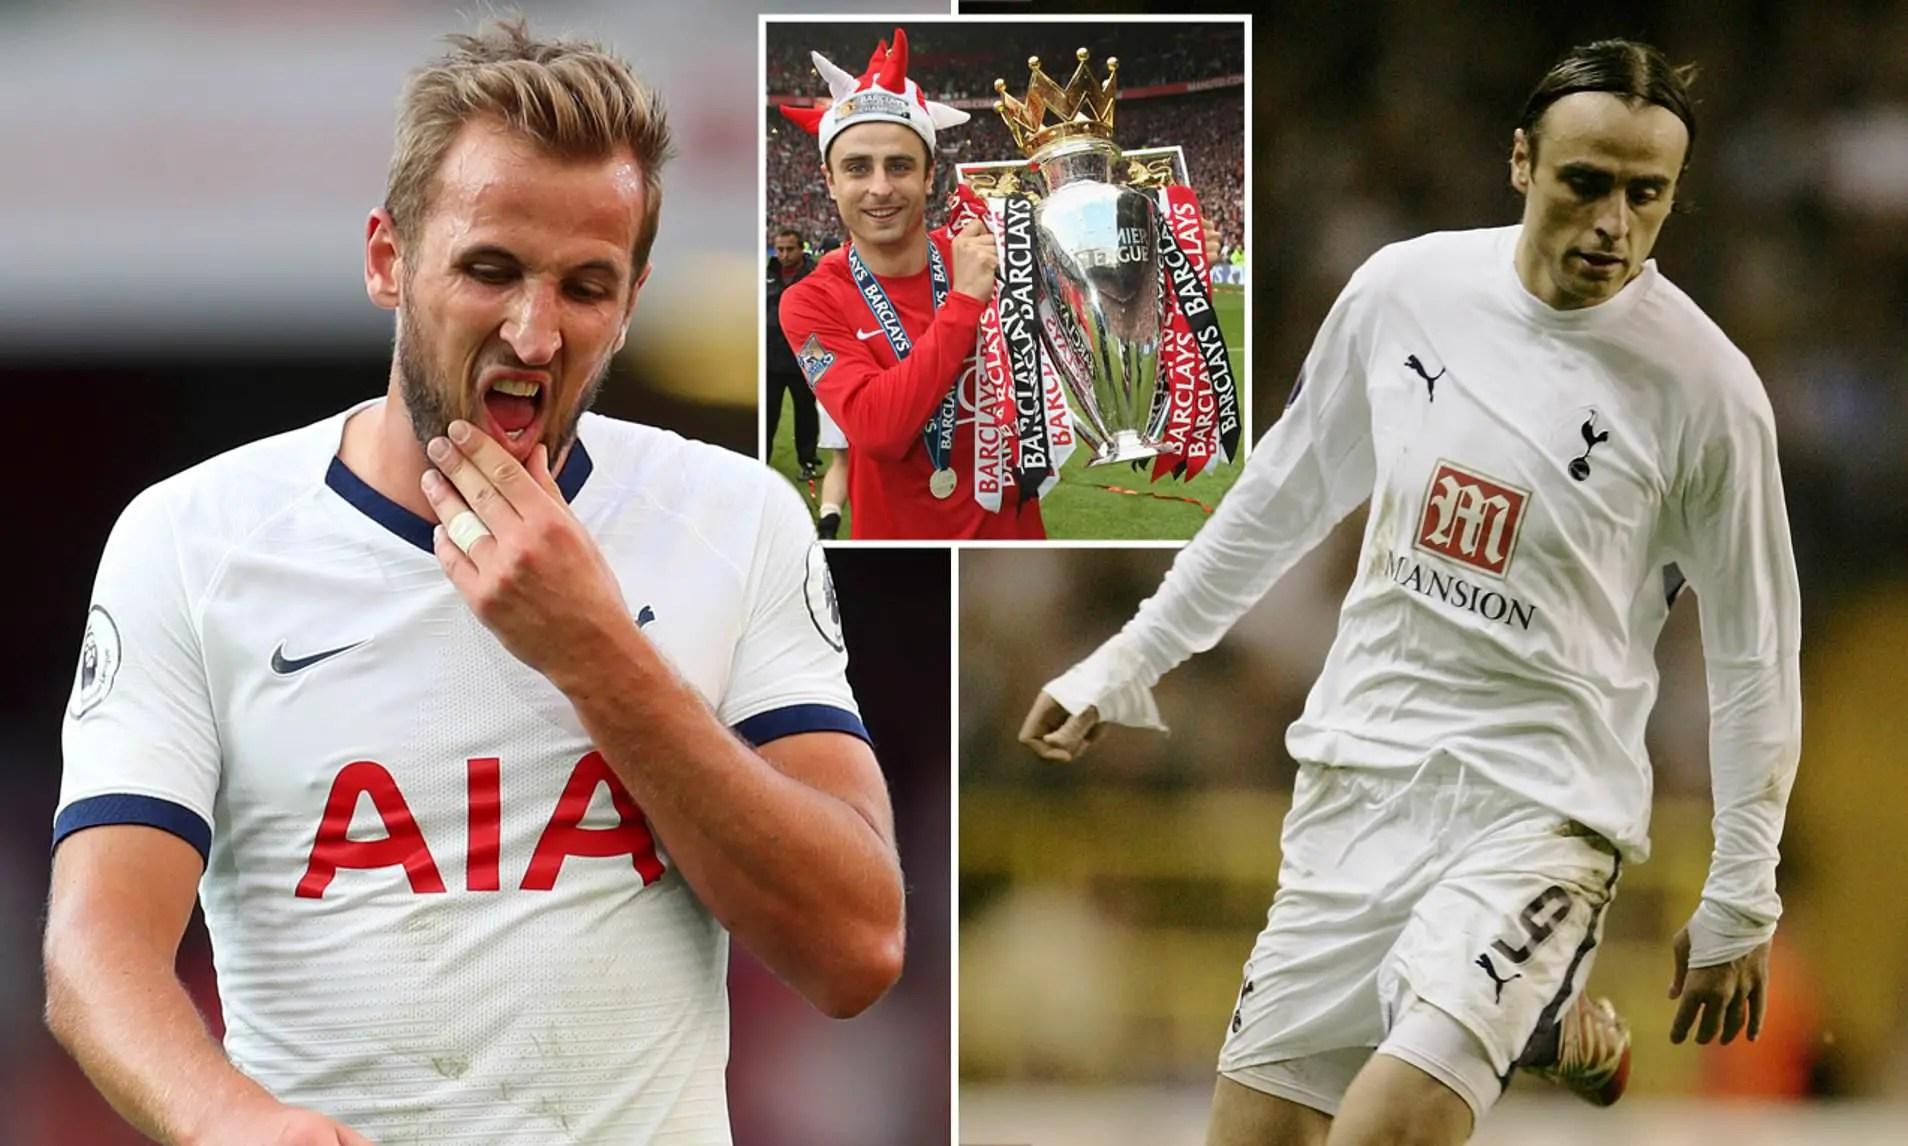 Berbatov Urges Kane To Dump Spurs For Man United To Save Career